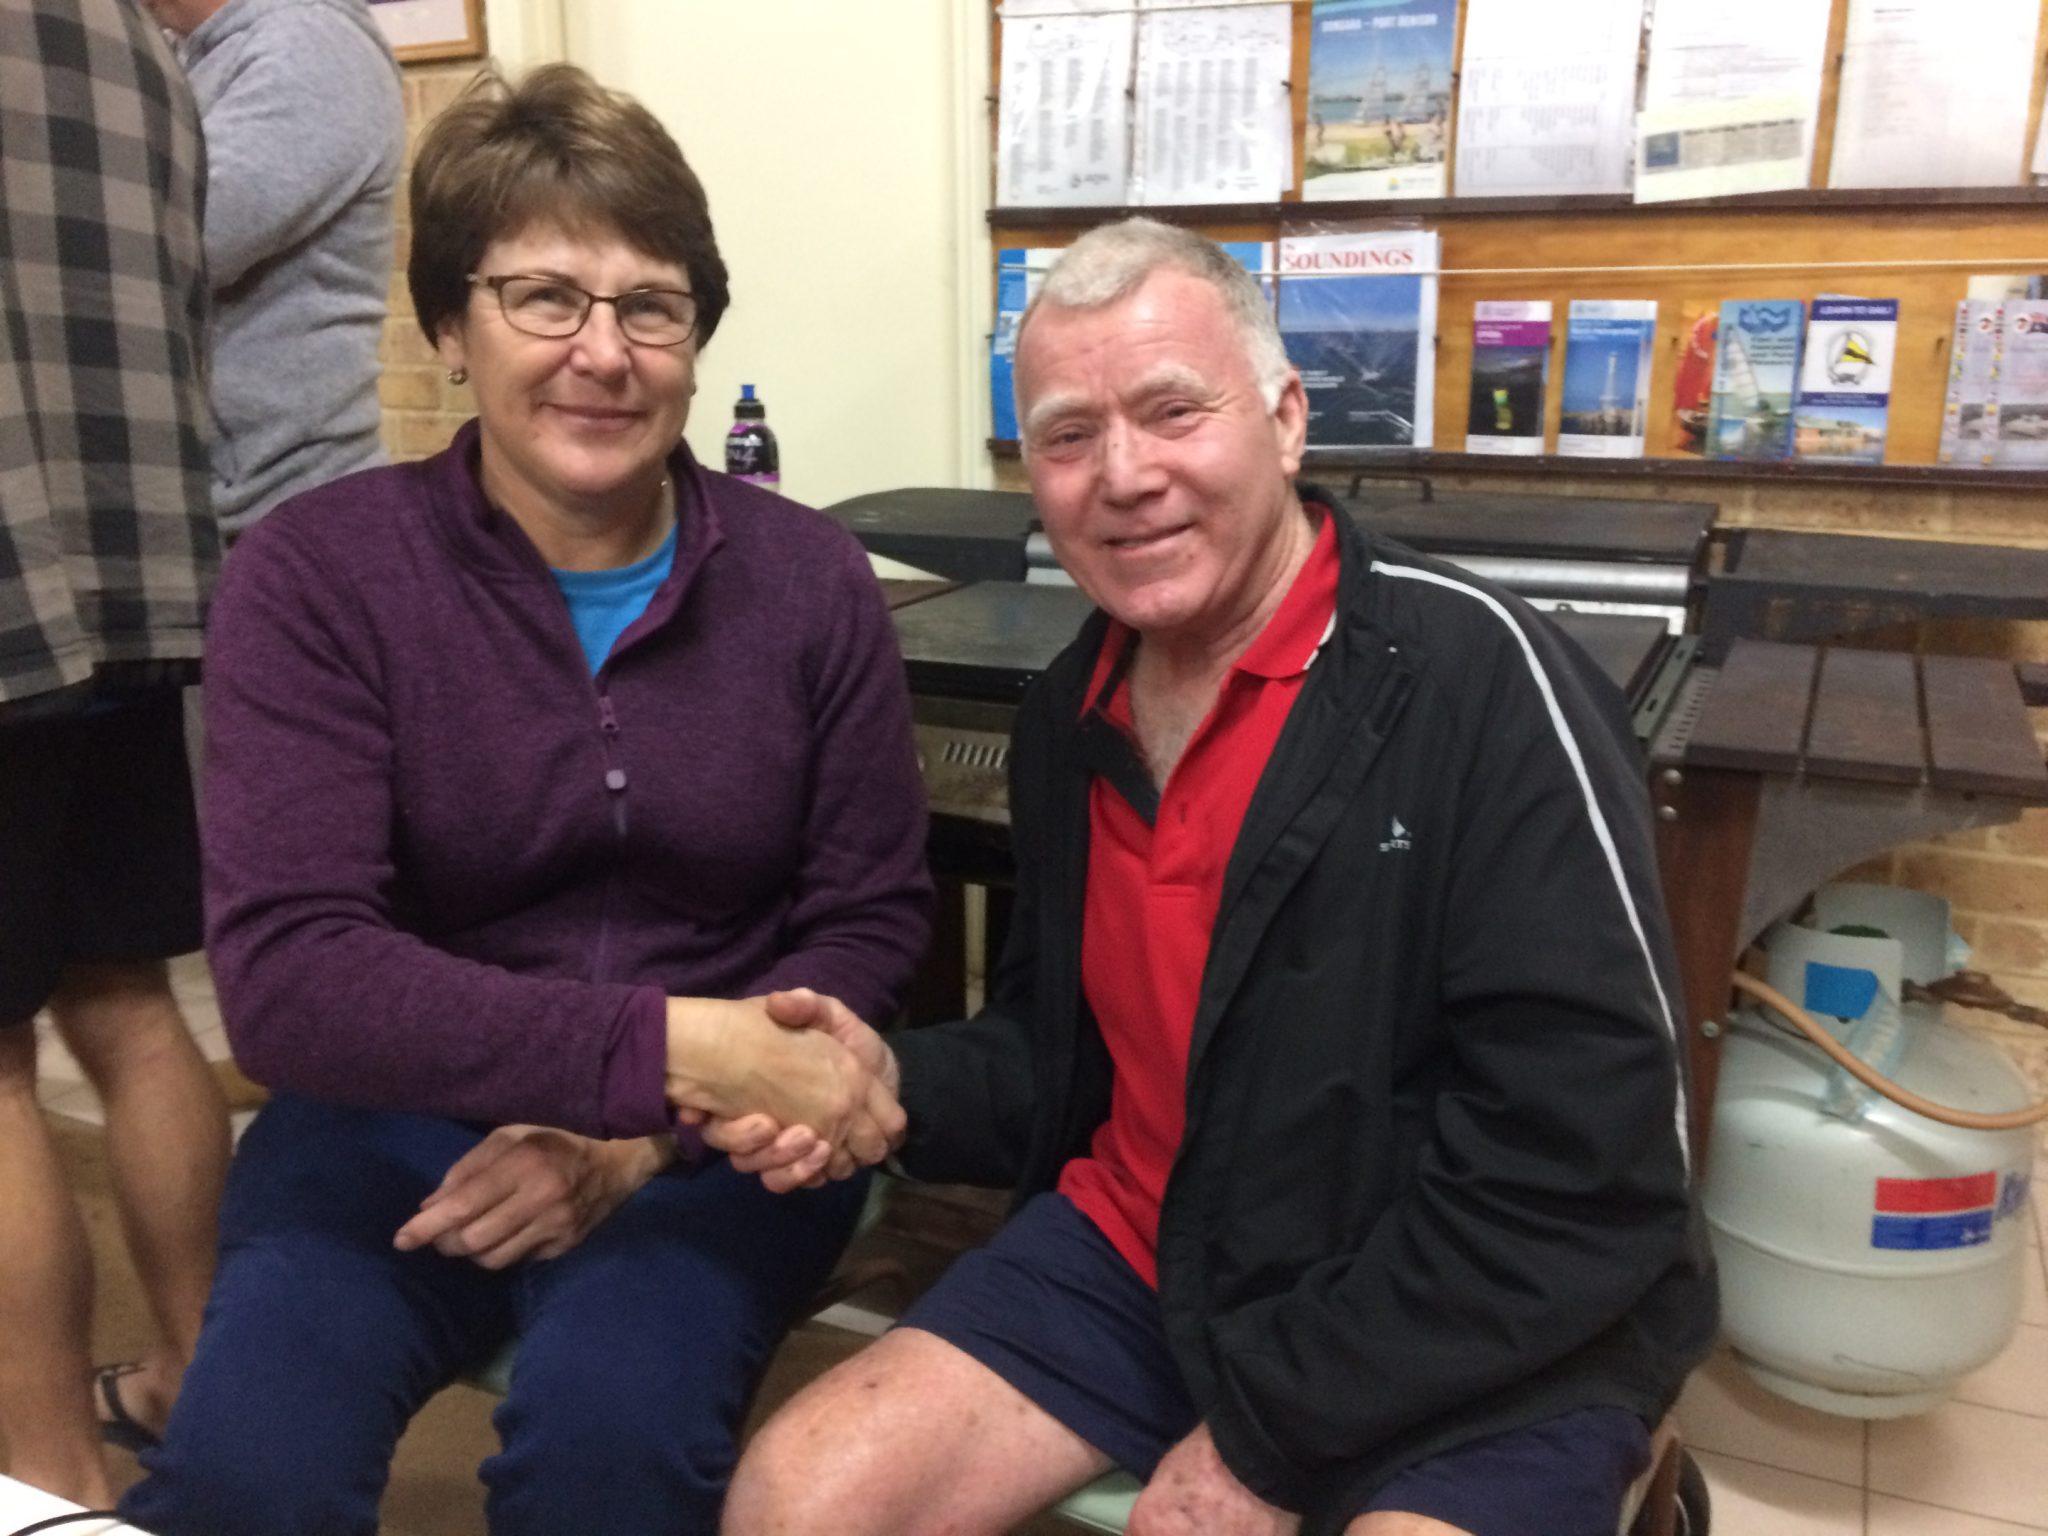 Tuesday 7th August 2018 : Tonight's photo shows Simone Burge congratulating this week's winner David Gardiner